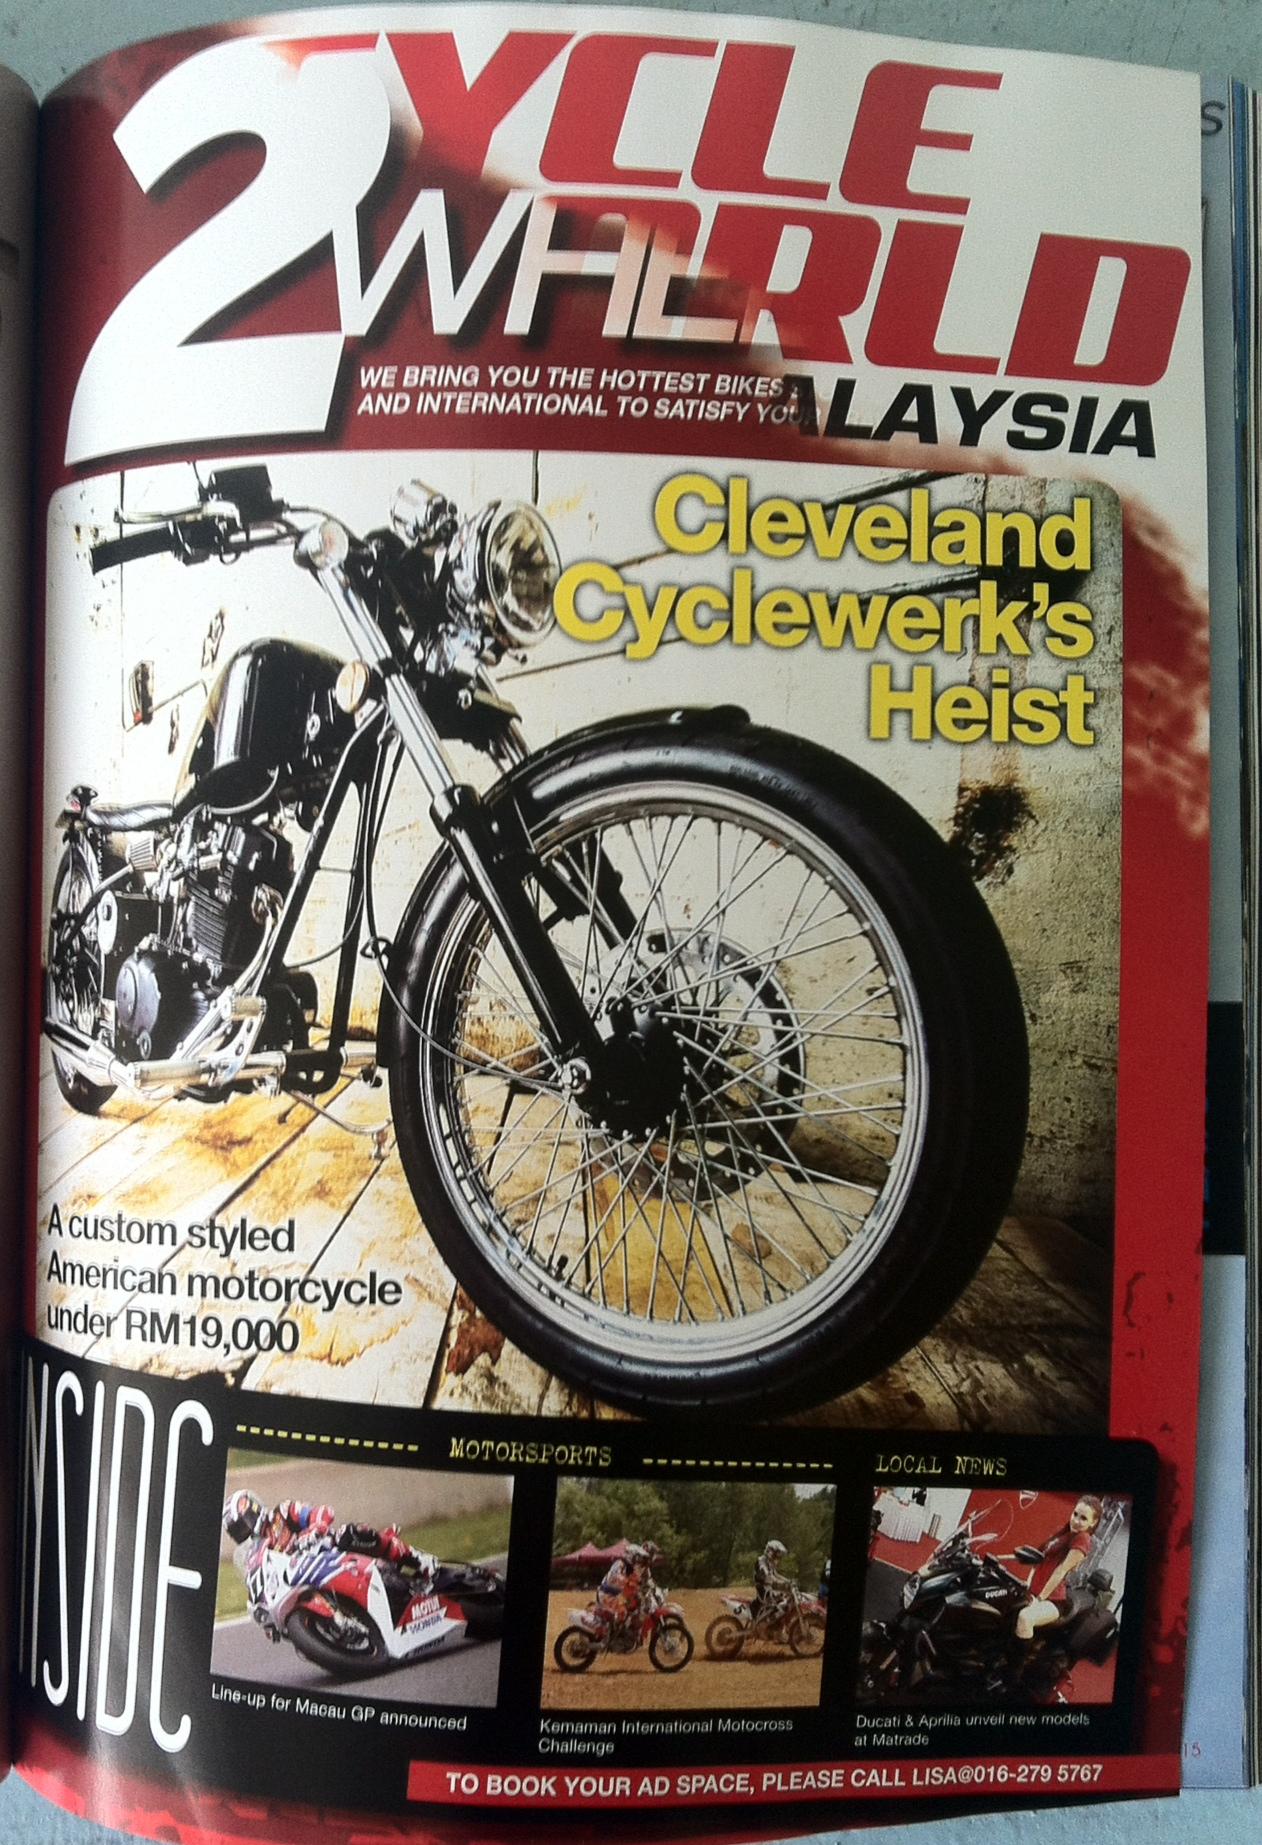 Cycle_World Malaysia 2013.JPG